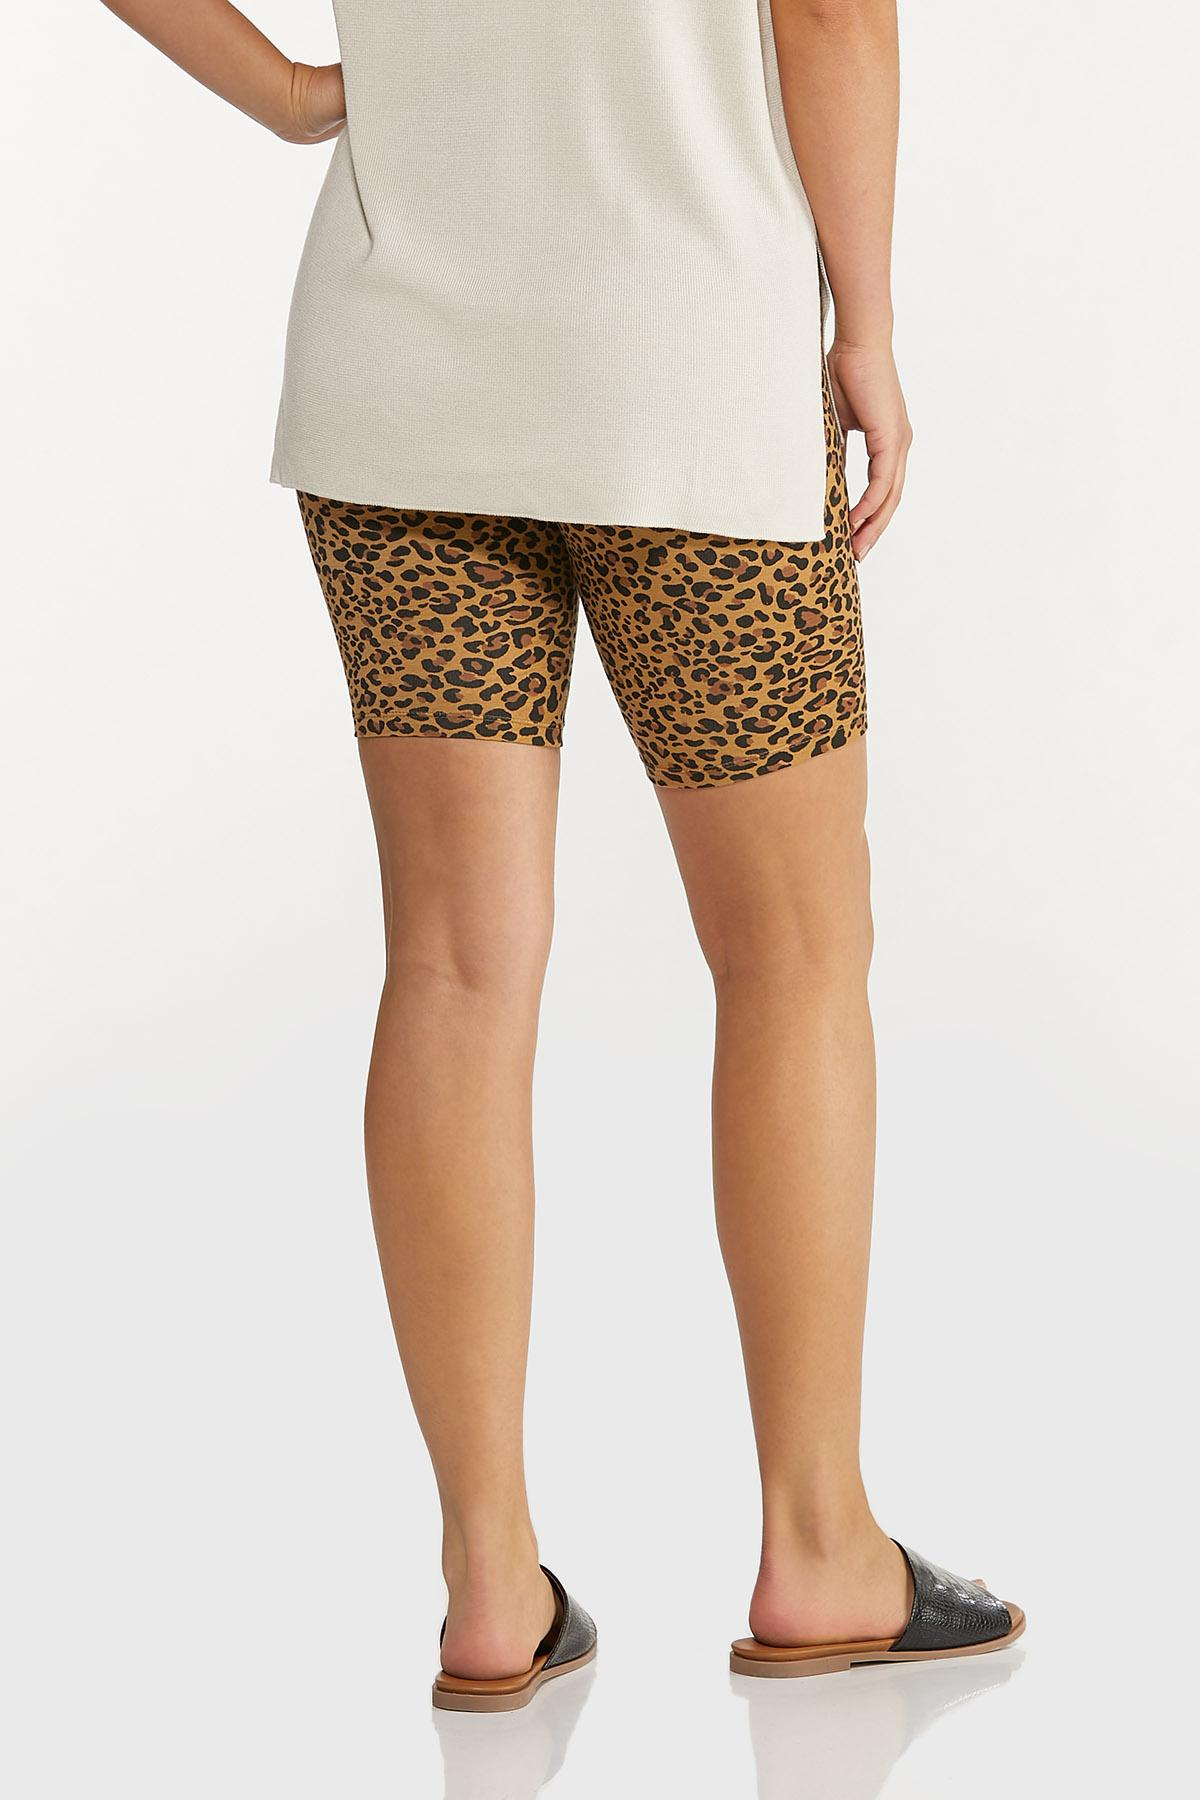 Leopard Biker Shorts (Item #44618357)